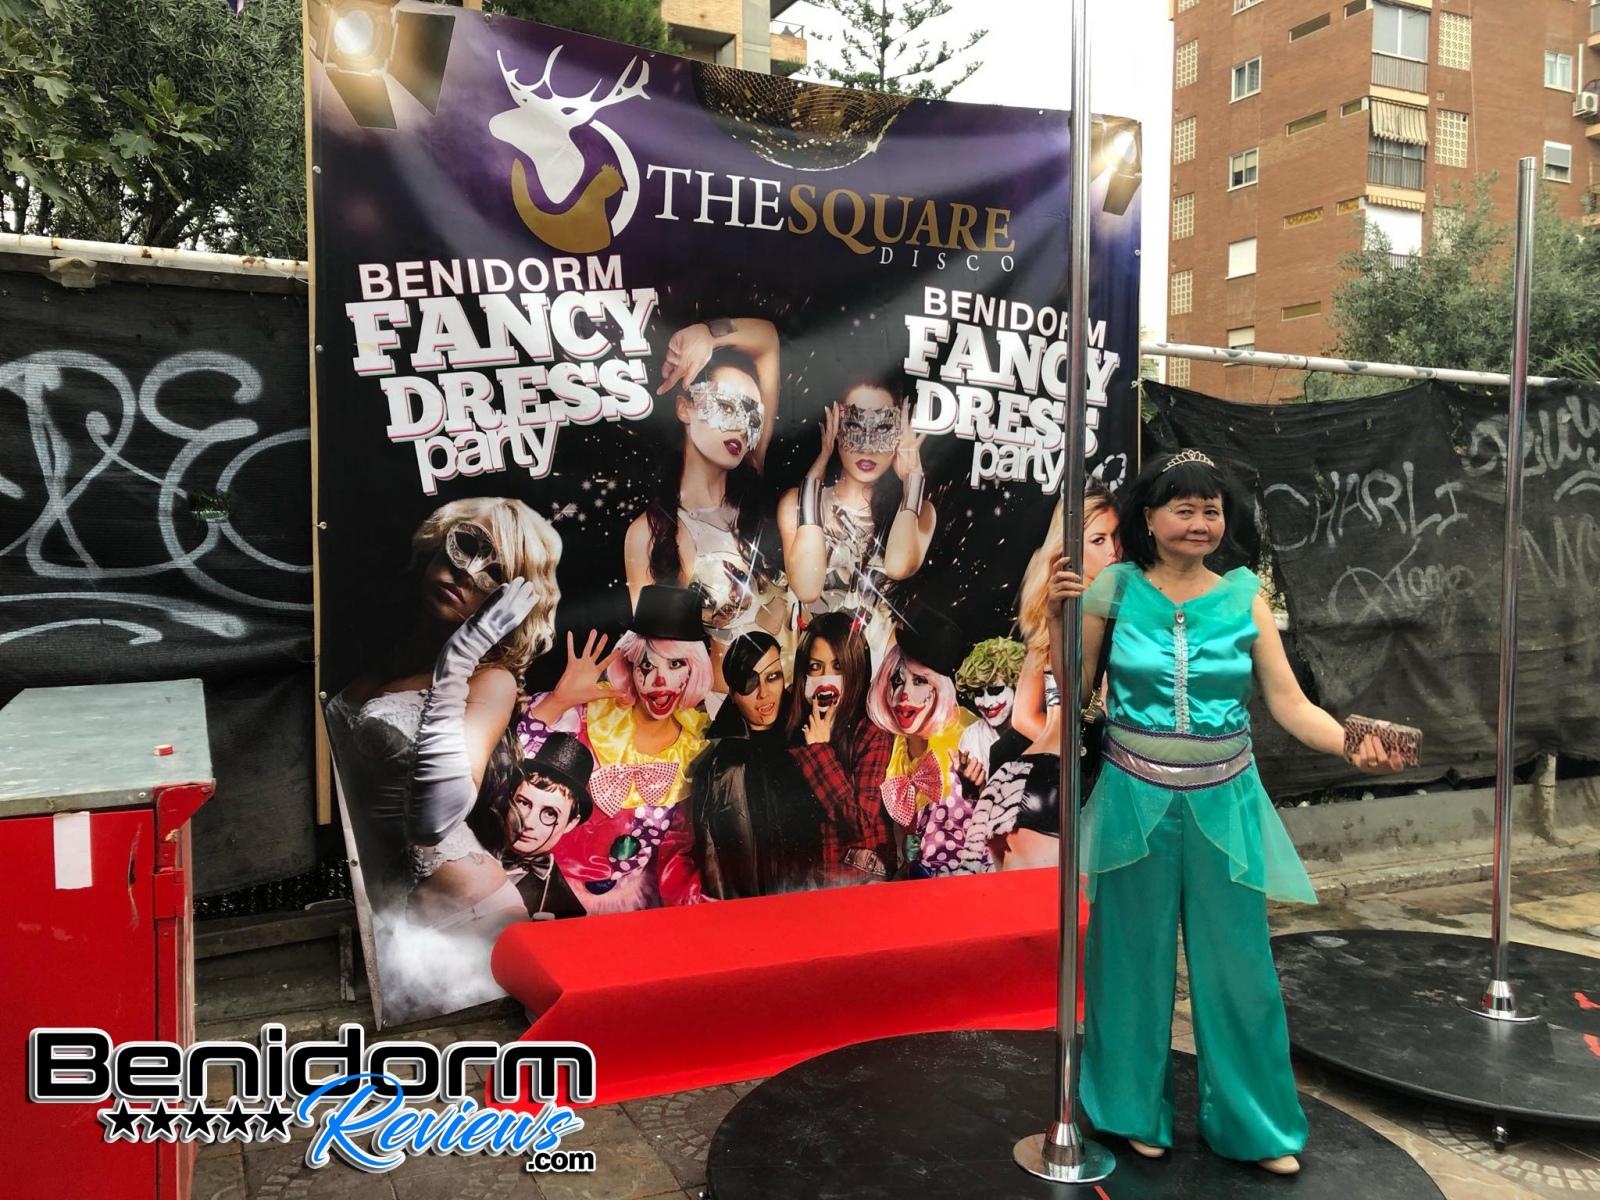 Benidorm-Fiestas-2019-Fancy-Dress-16